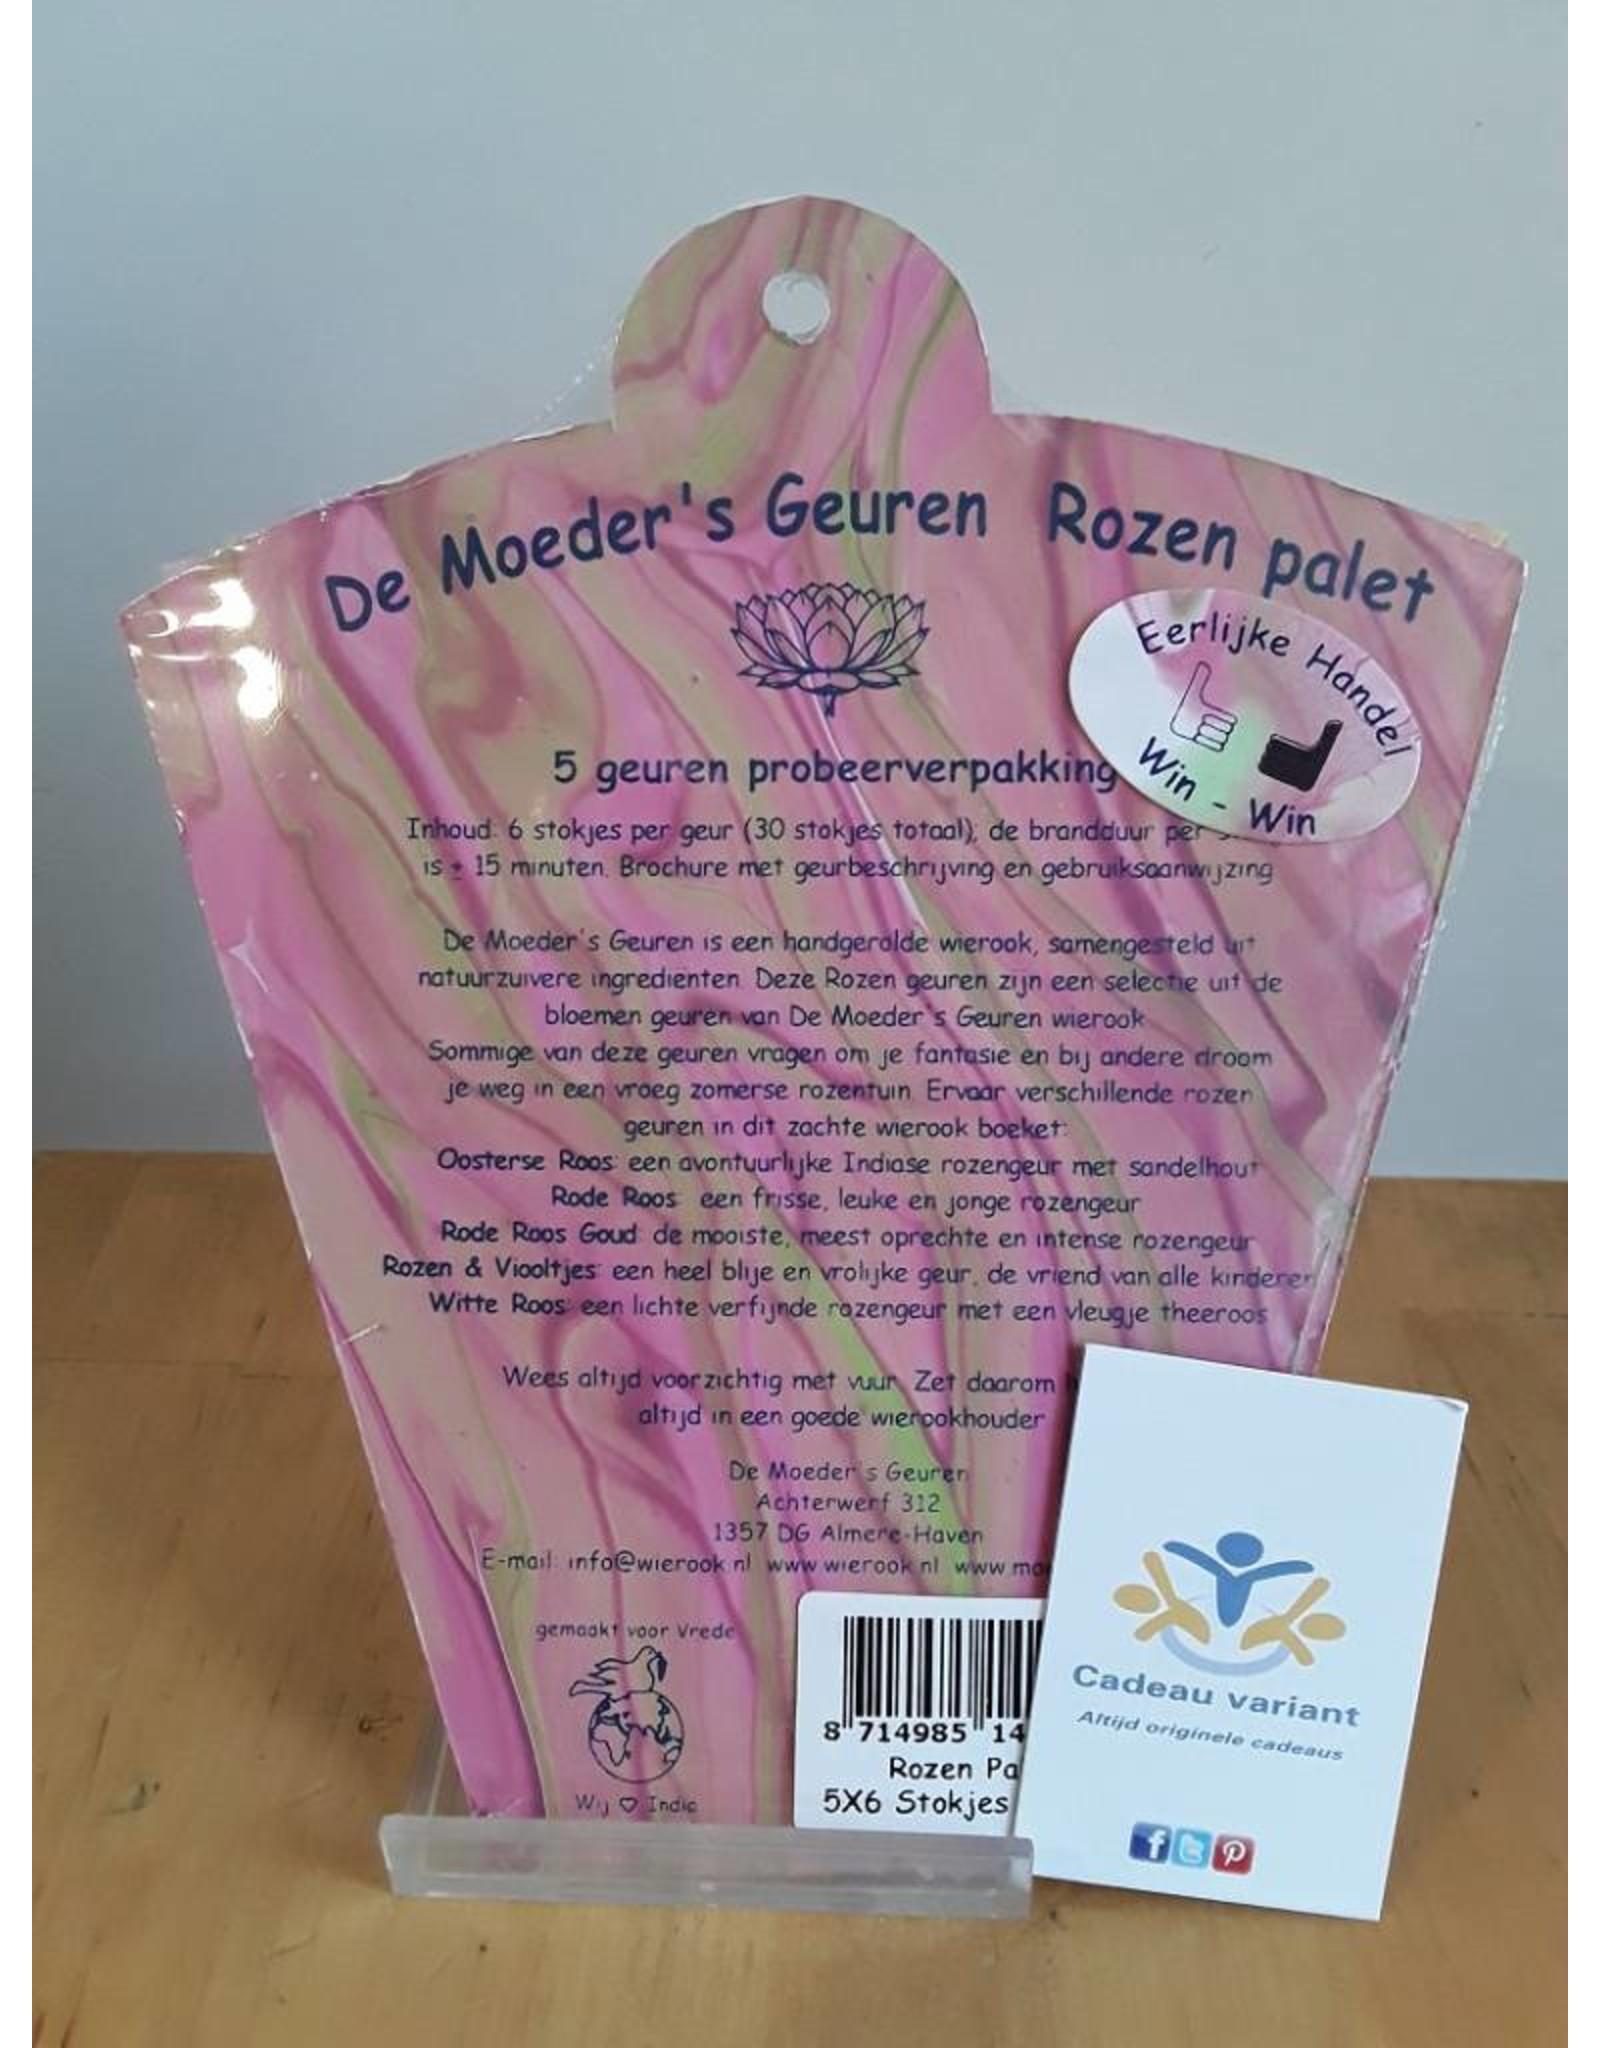 Moeders geuren wierook Wierook rozen palet cadeauset